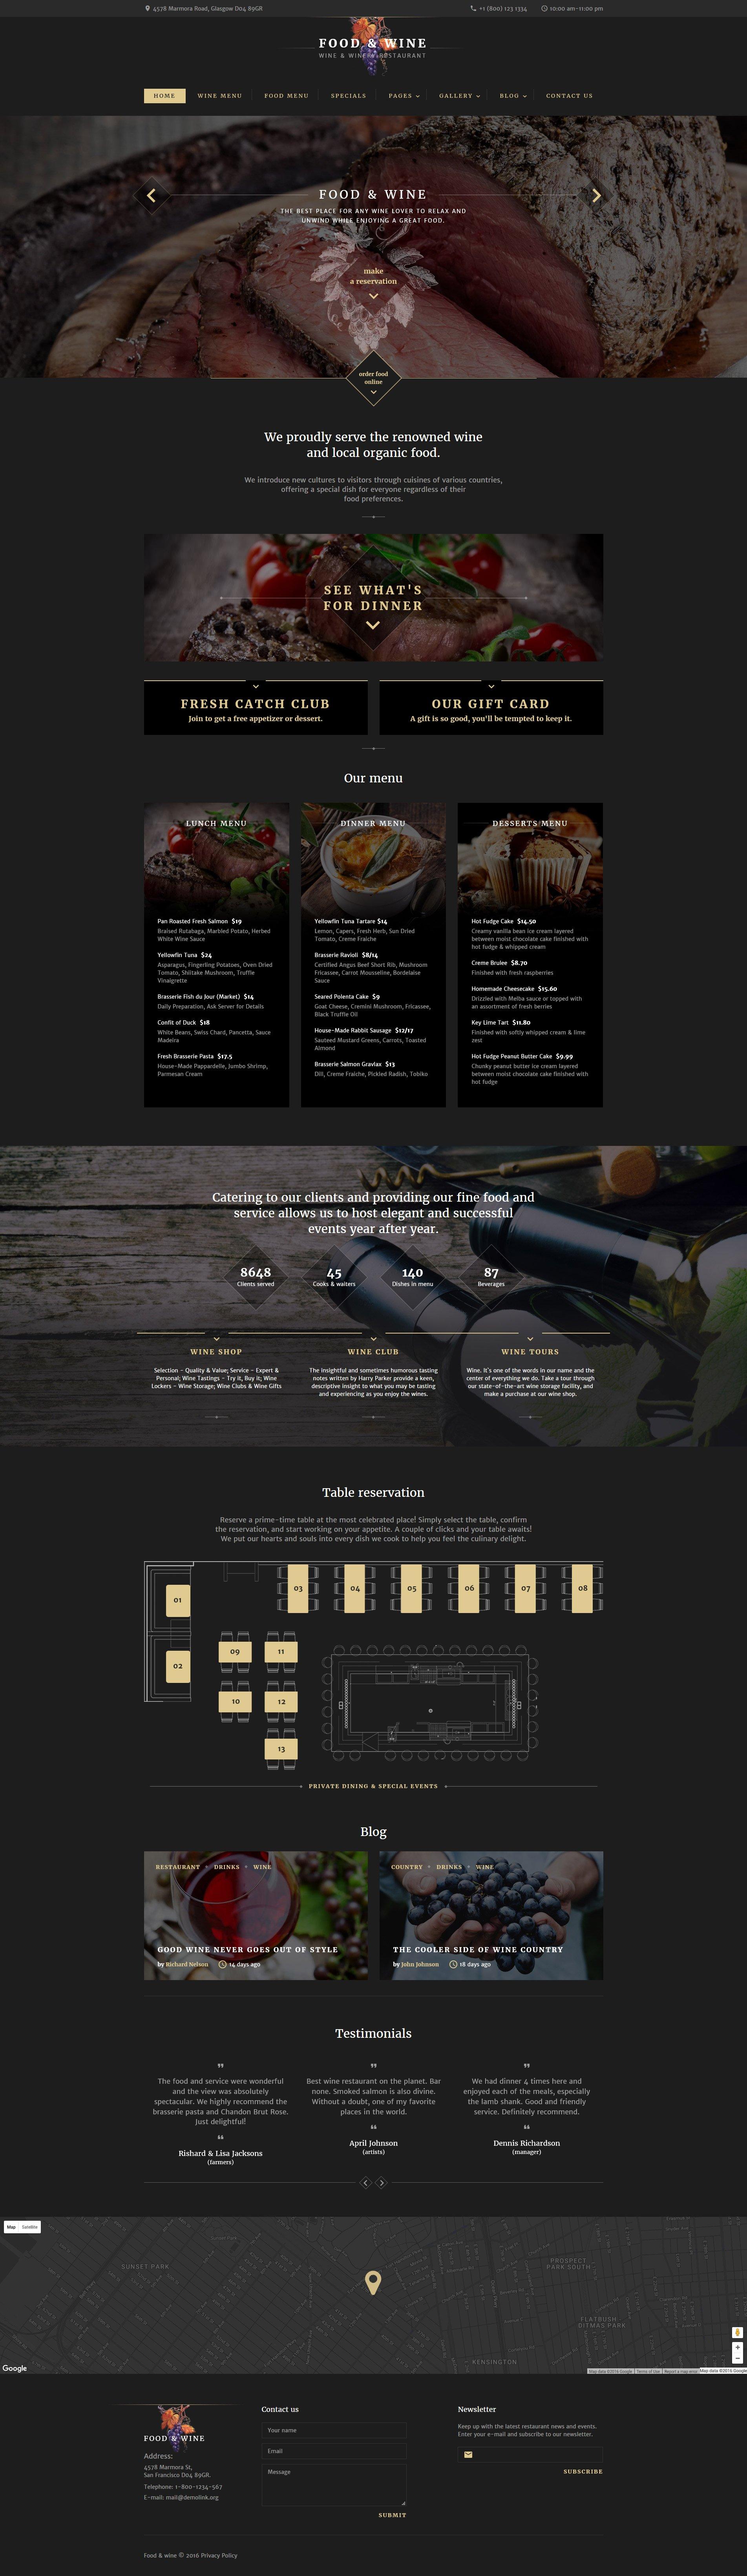 """Food  Wine"" 响应式网页模板 #60038 - 截图"